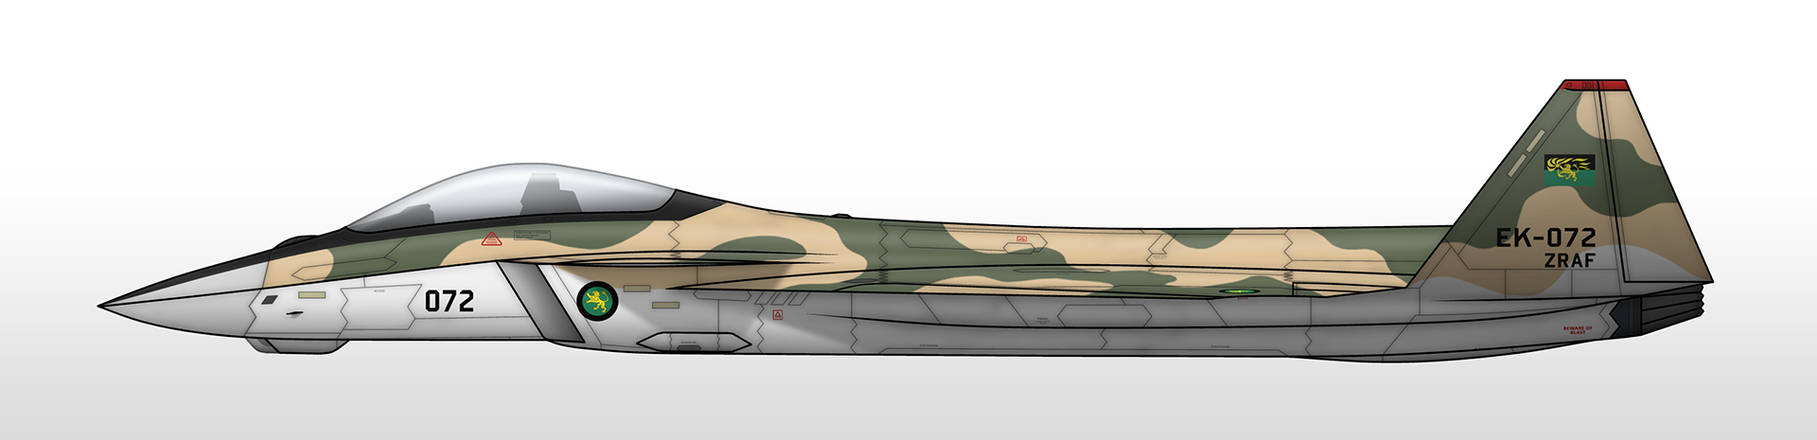 JAS-41A - Zamundan Royal Air Force